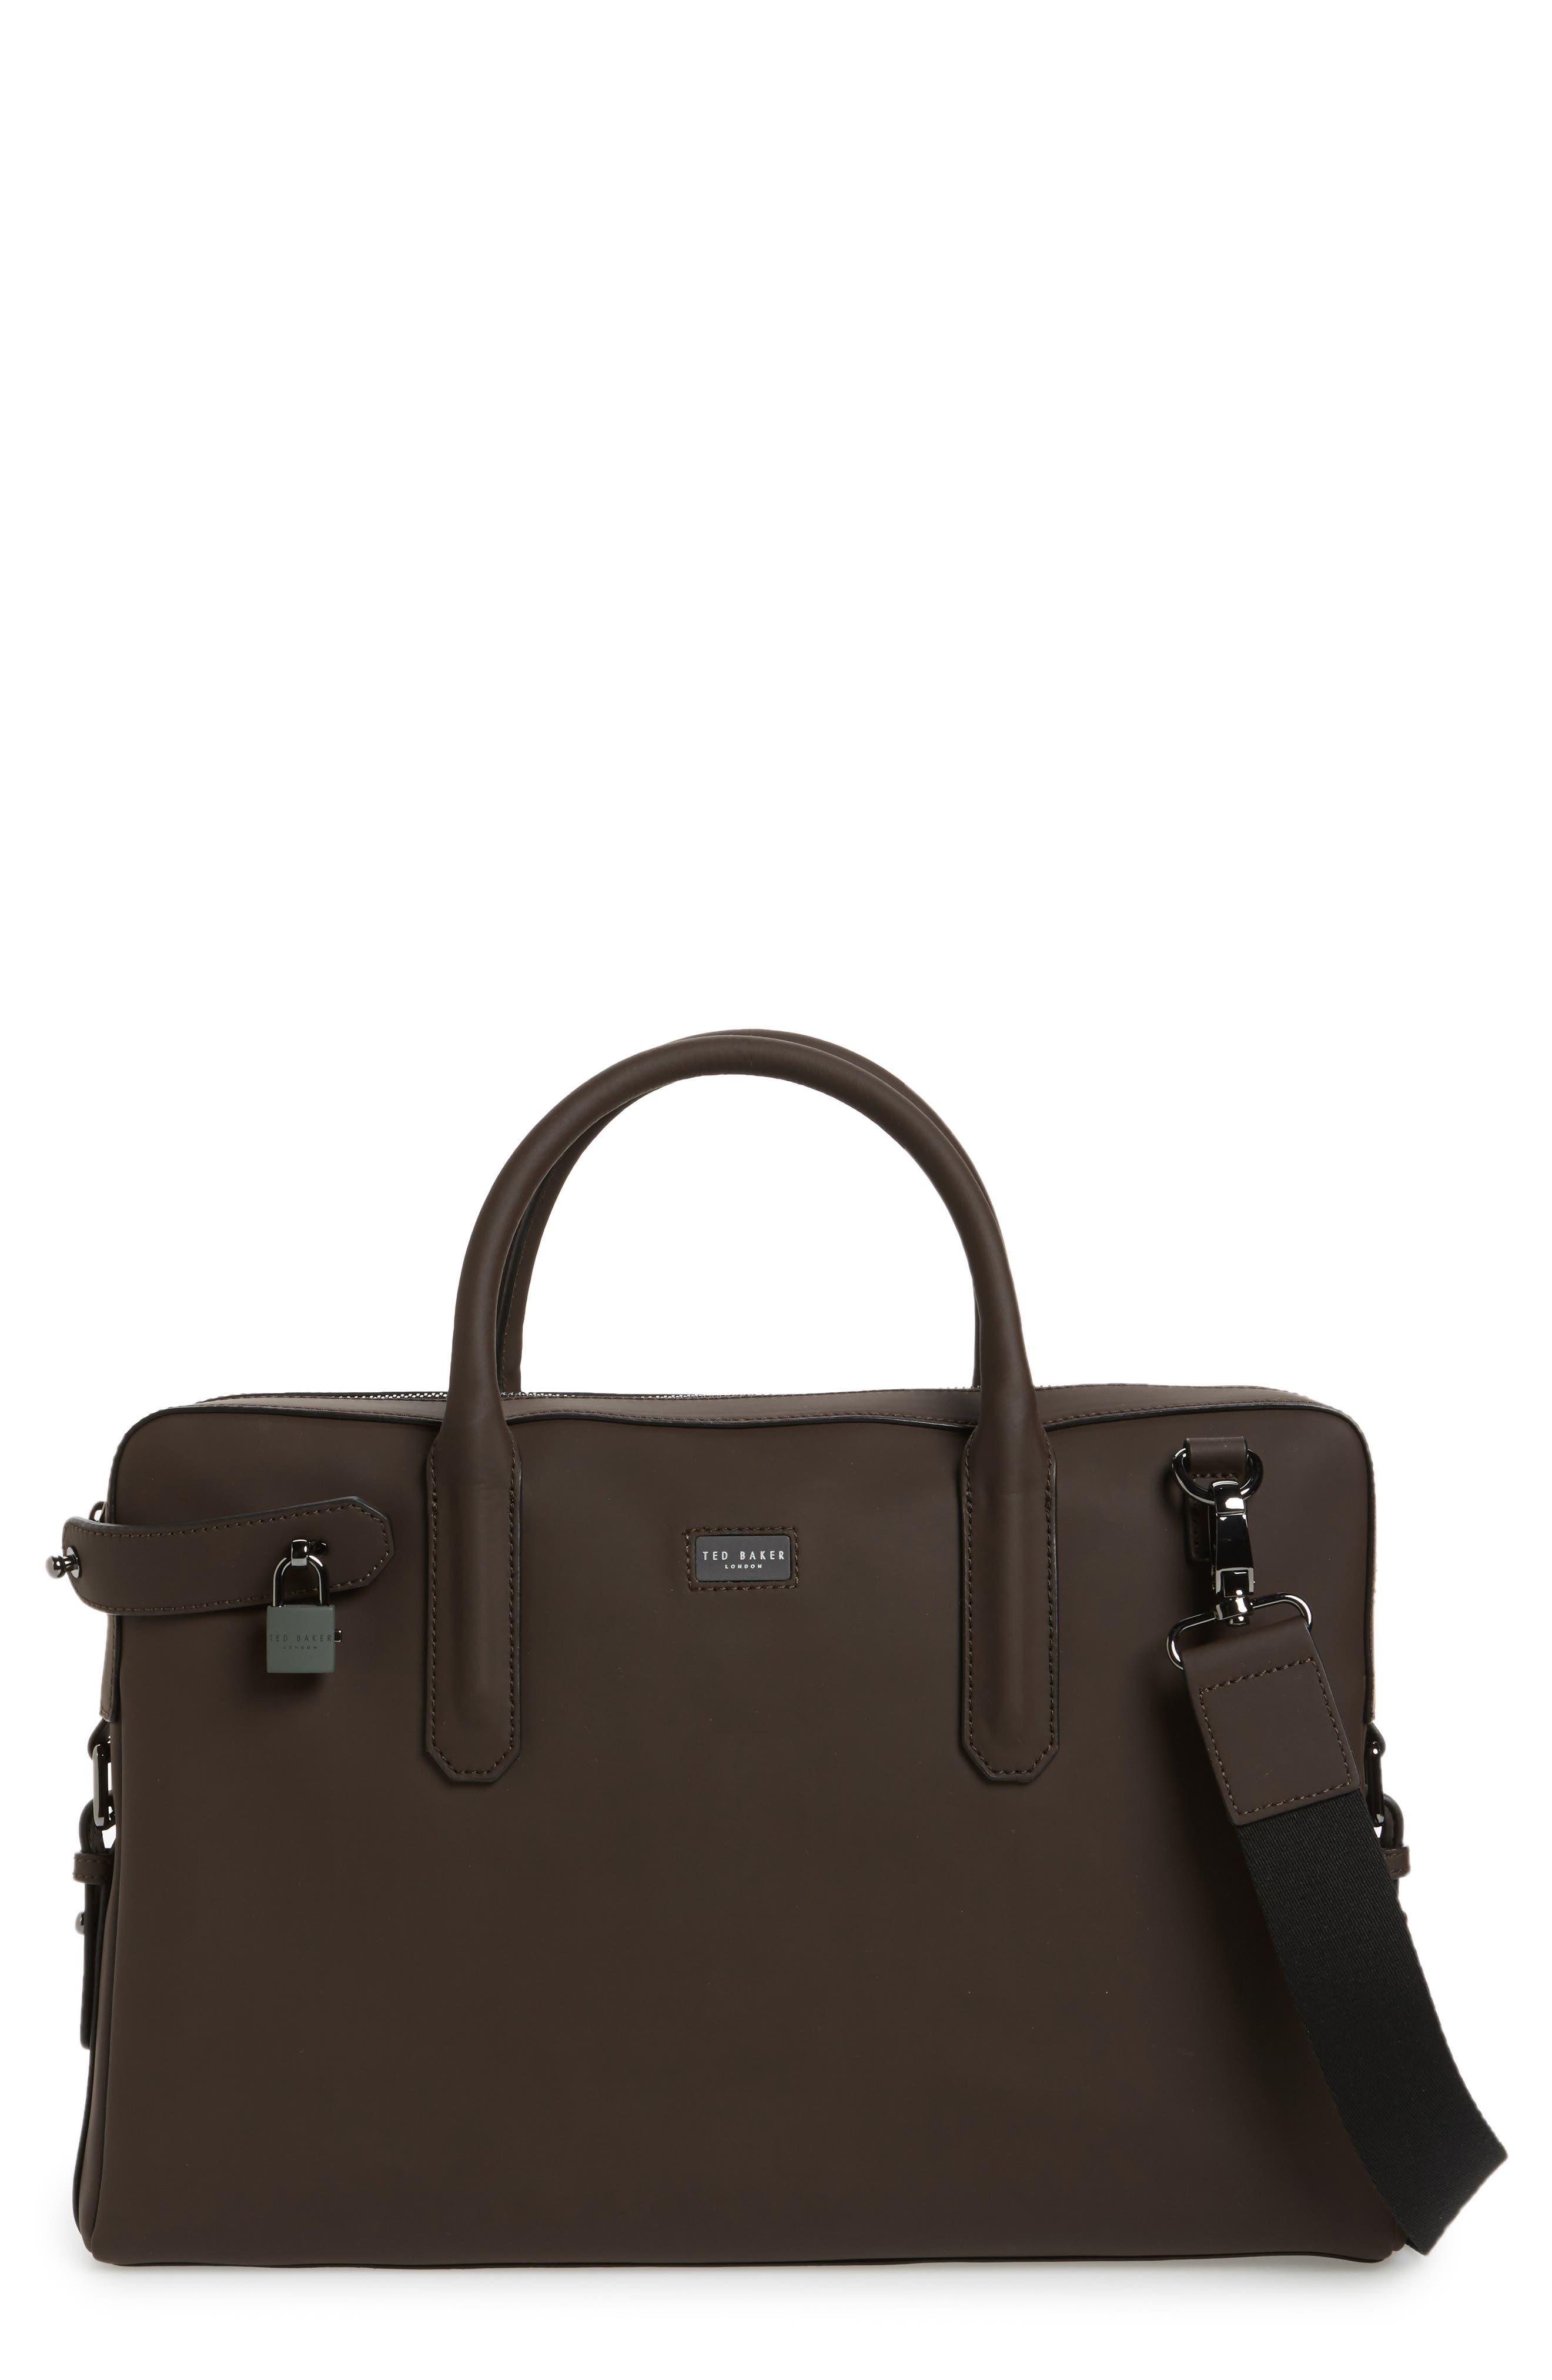 Ozboz Leather Briefcase,                             Main thumbnail 1, color,                             214